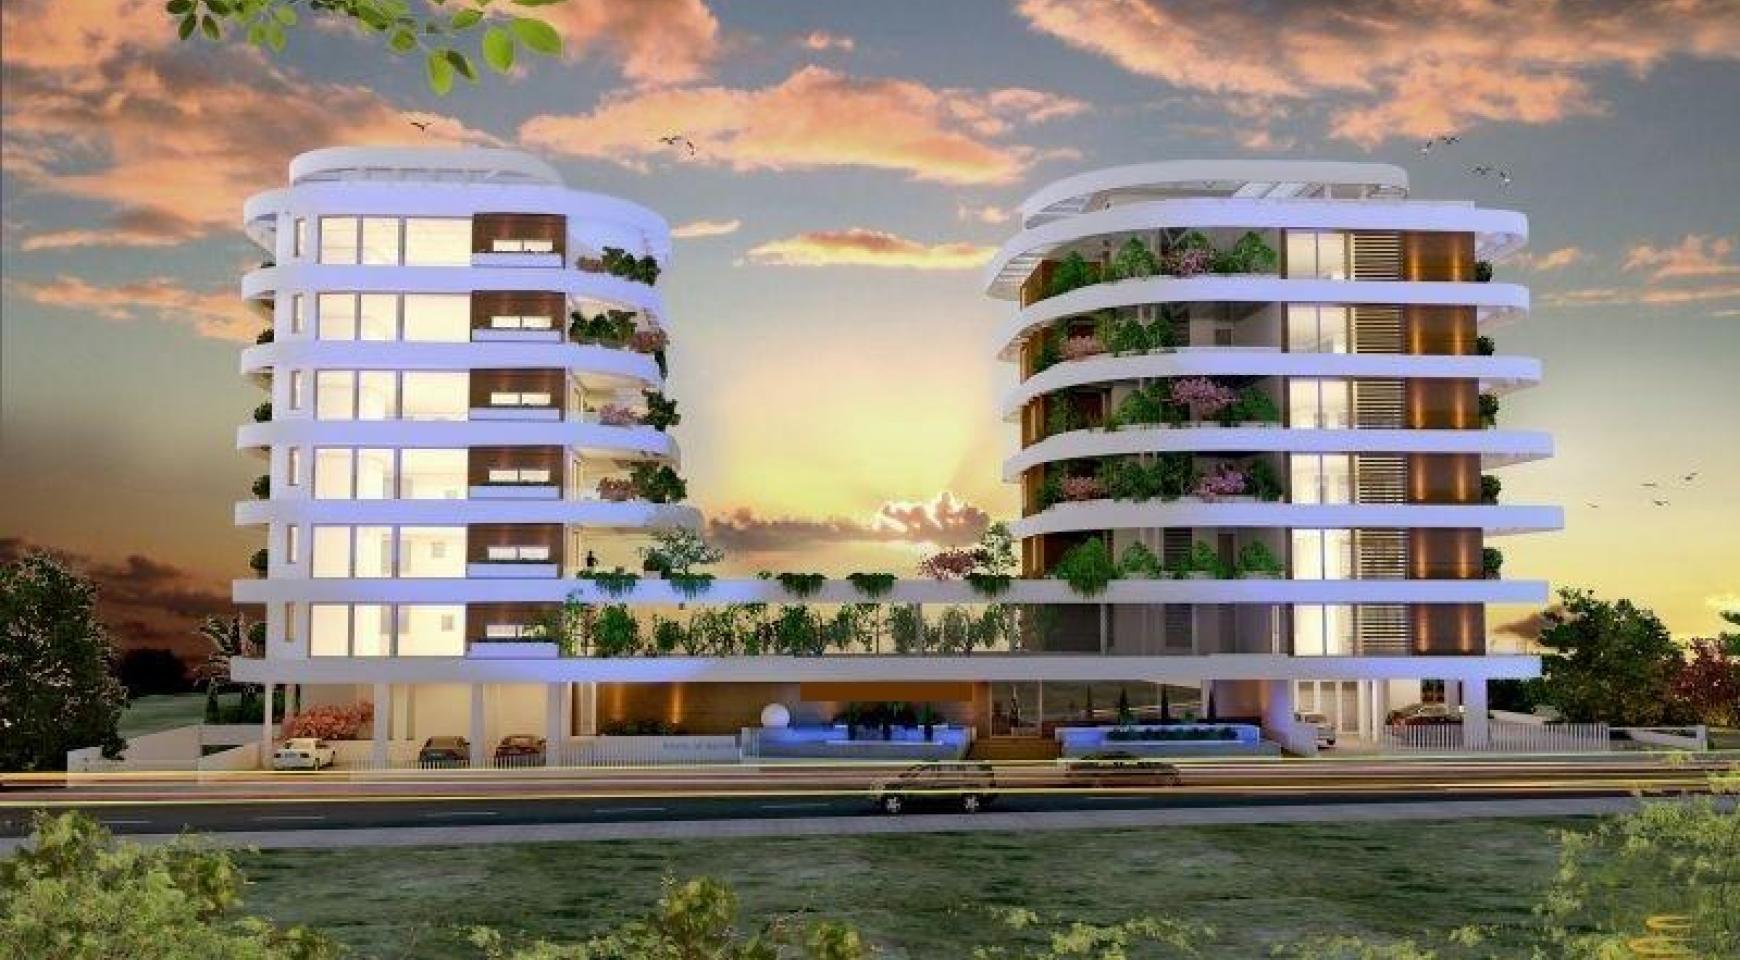 New 2 Bedroom Apartment near the Sea - 2